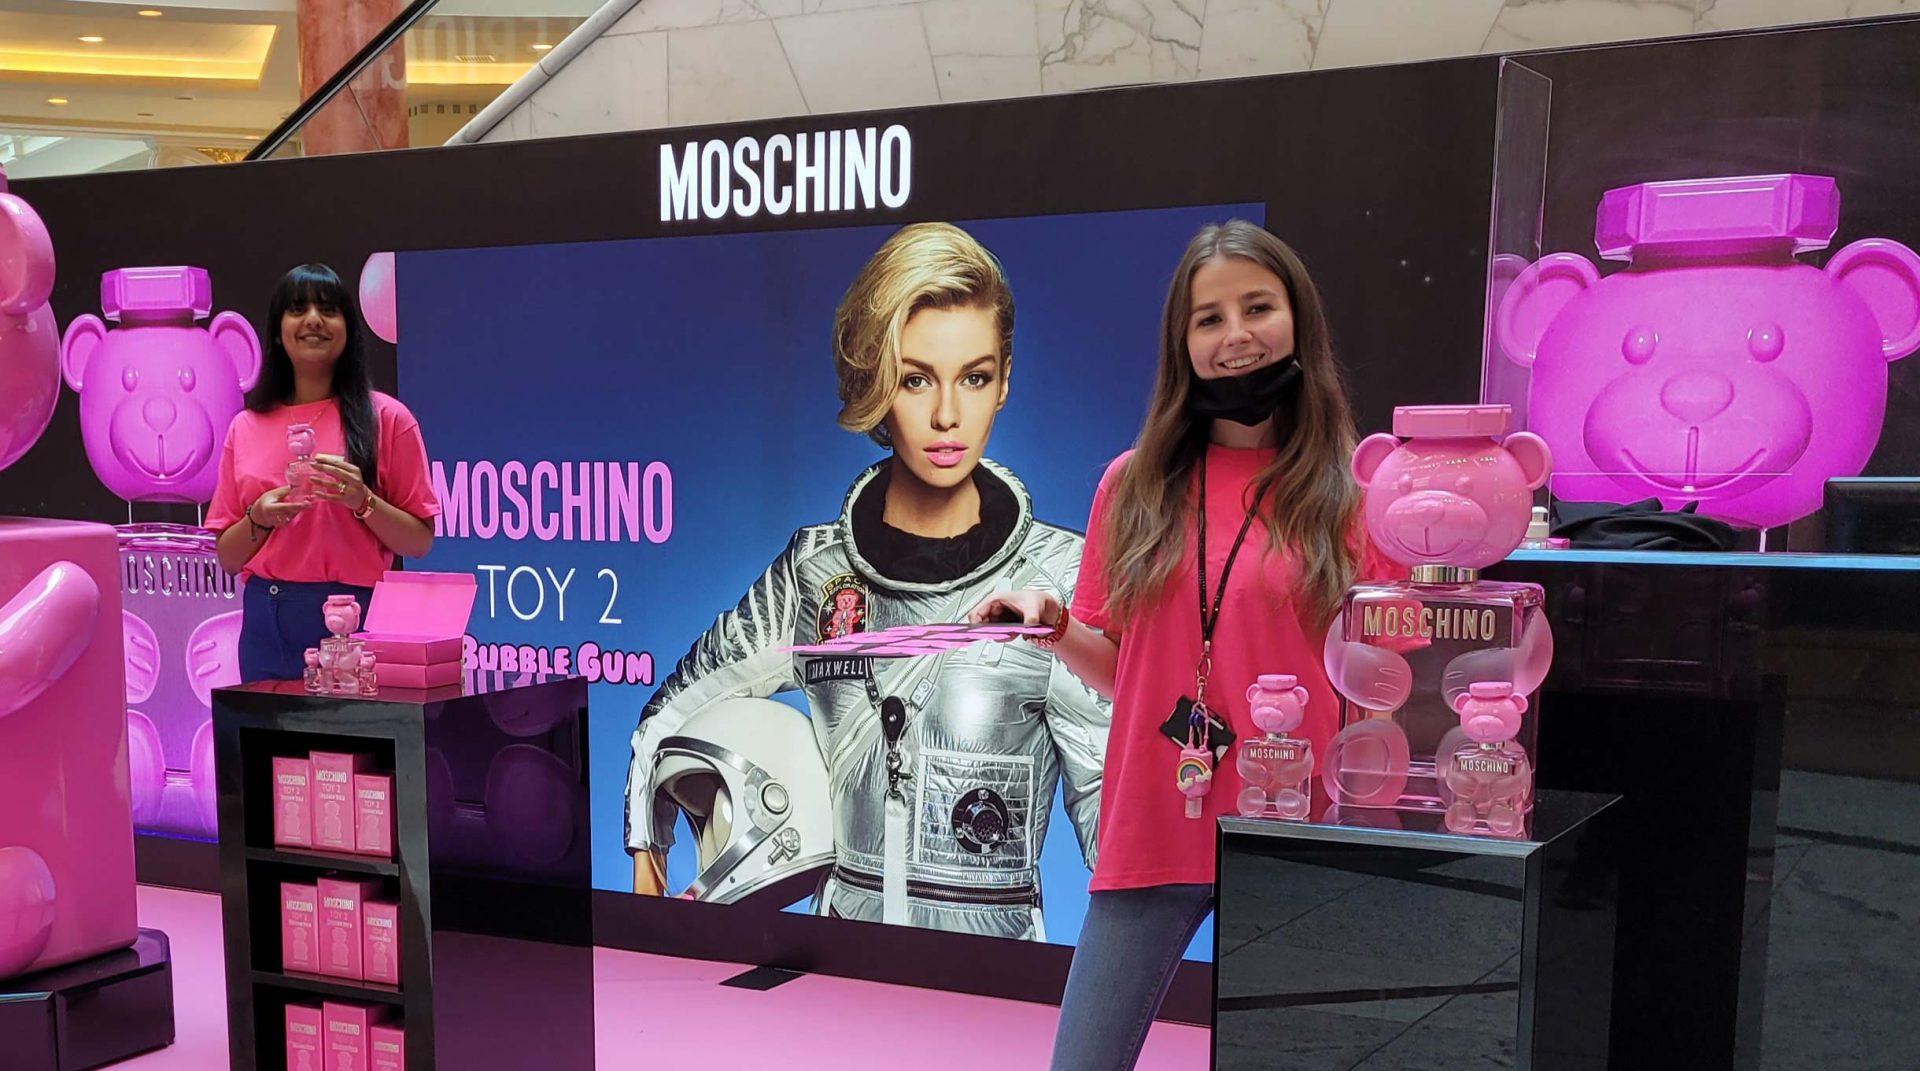 Moschino Bubblegum sites